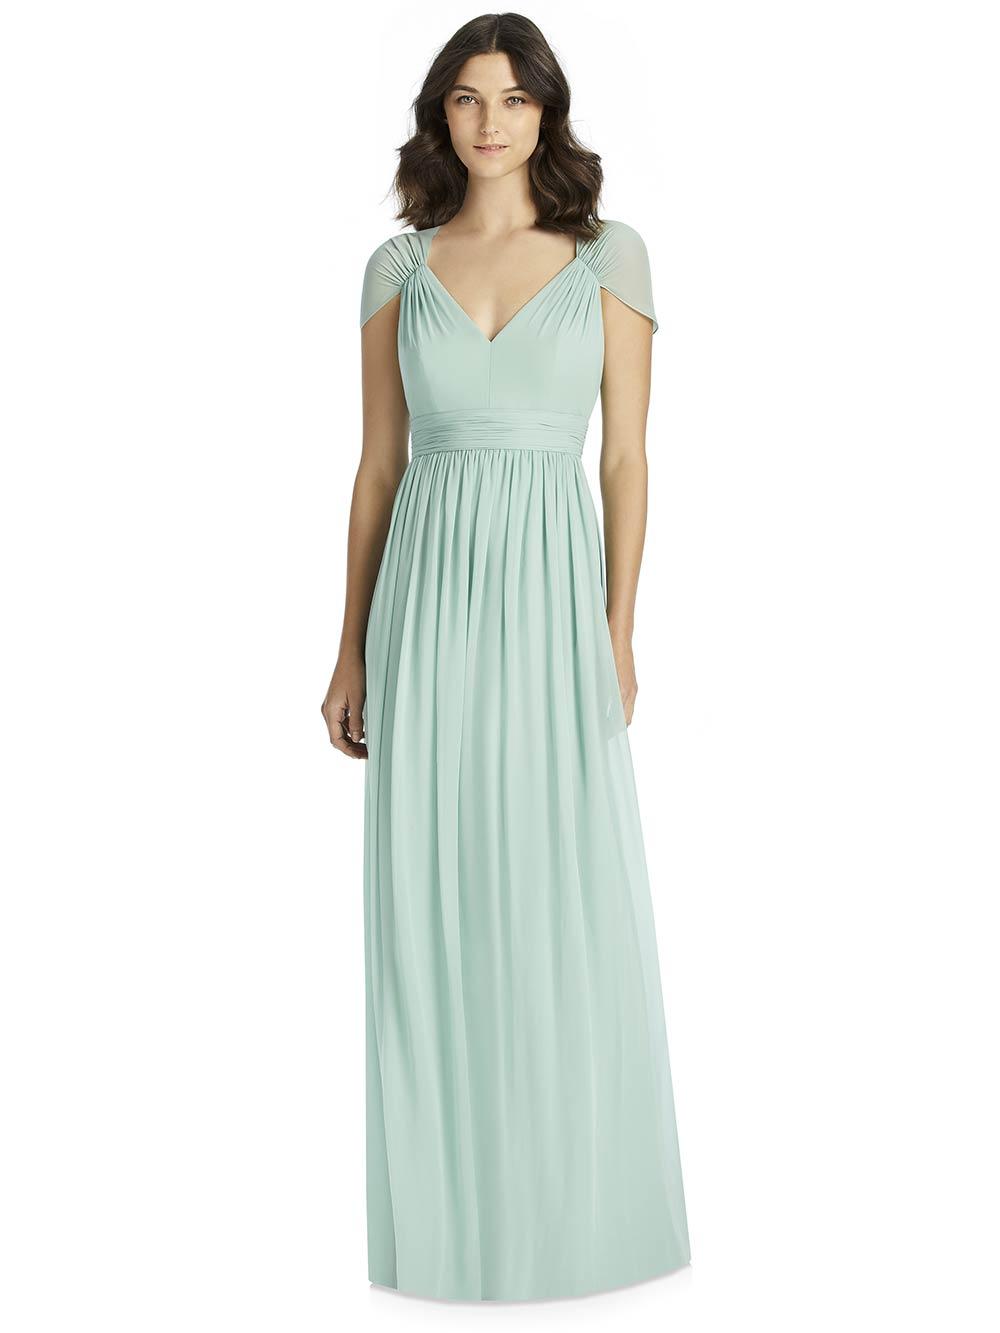 bridesmaid-dresses-dessy-27188